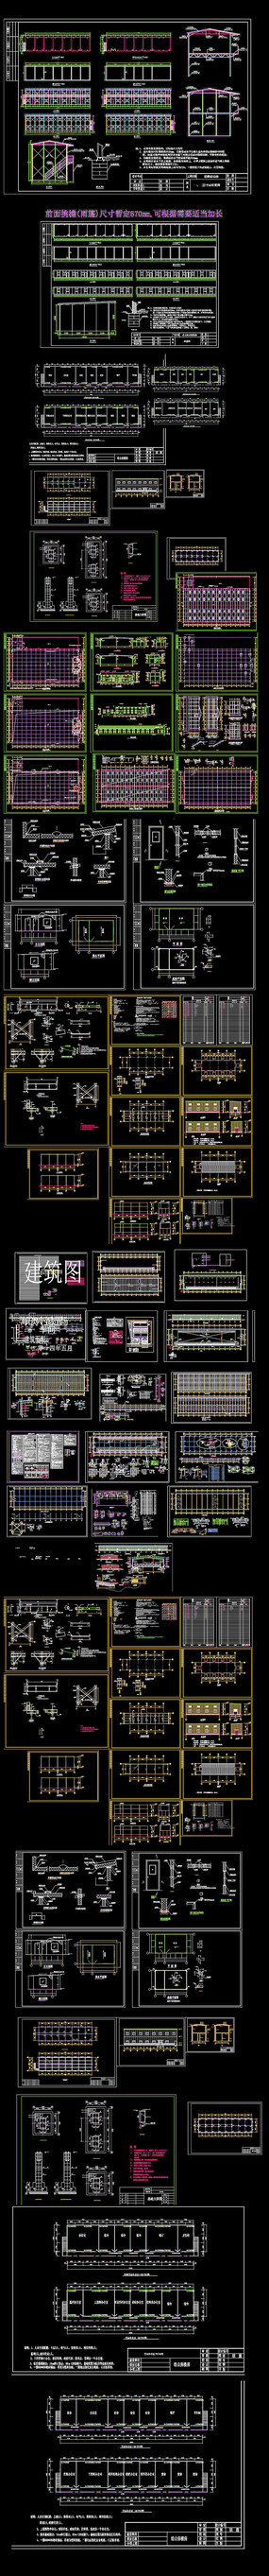 钢架结构厂房CAD方案图